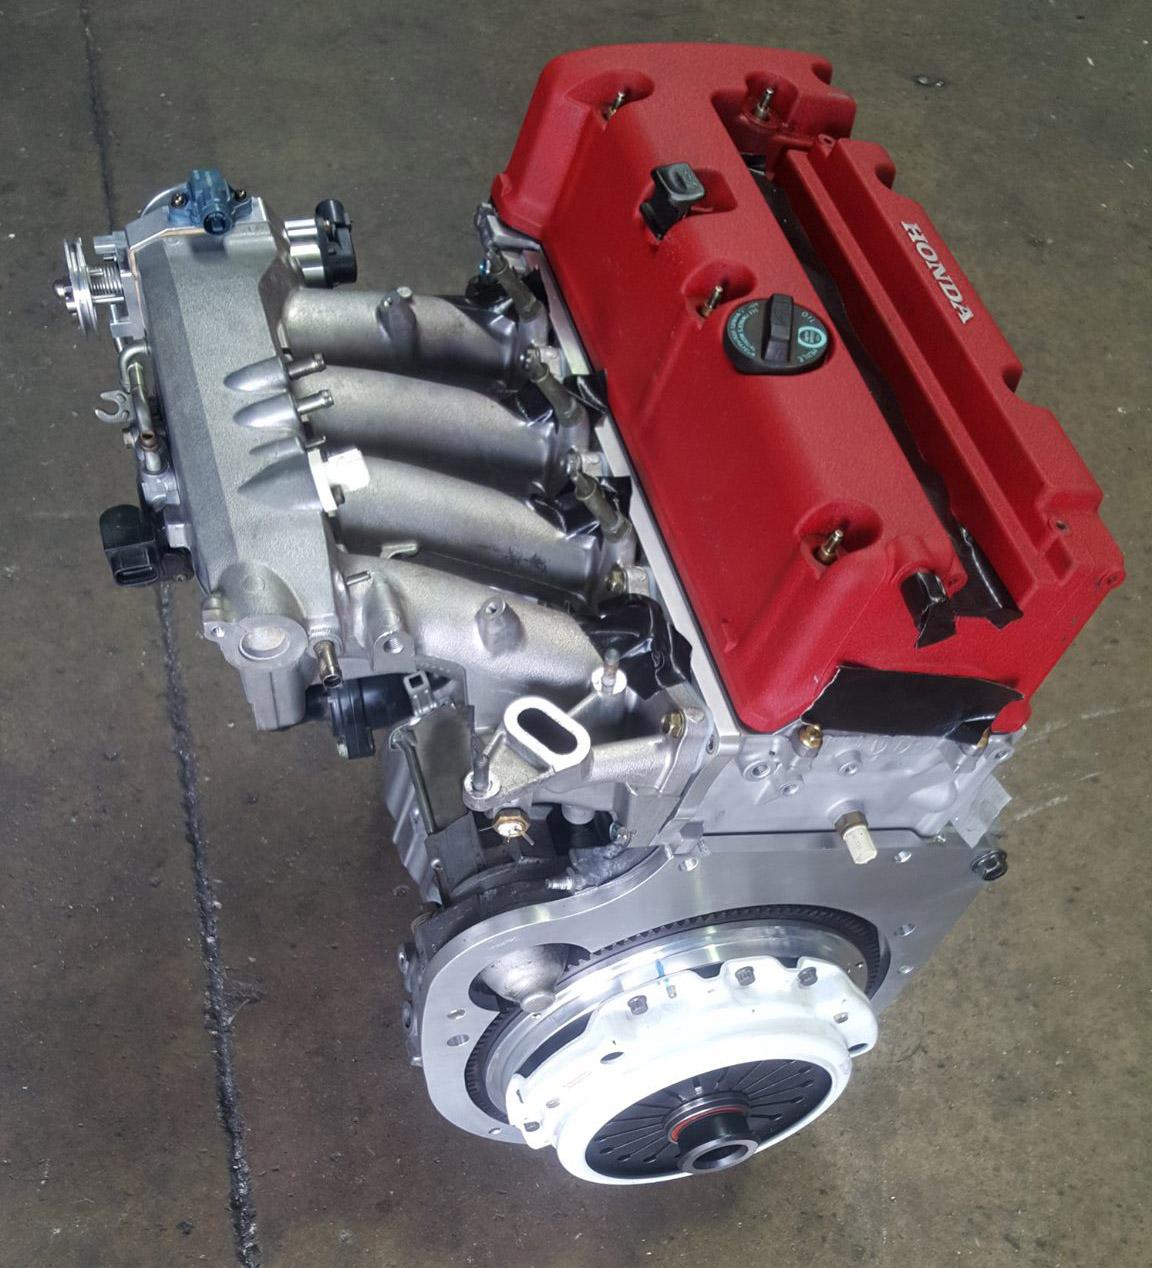 2018 Mazda Rx7 >> Mazda RX-7 with a Turbo K20 – Engine Swap Depot